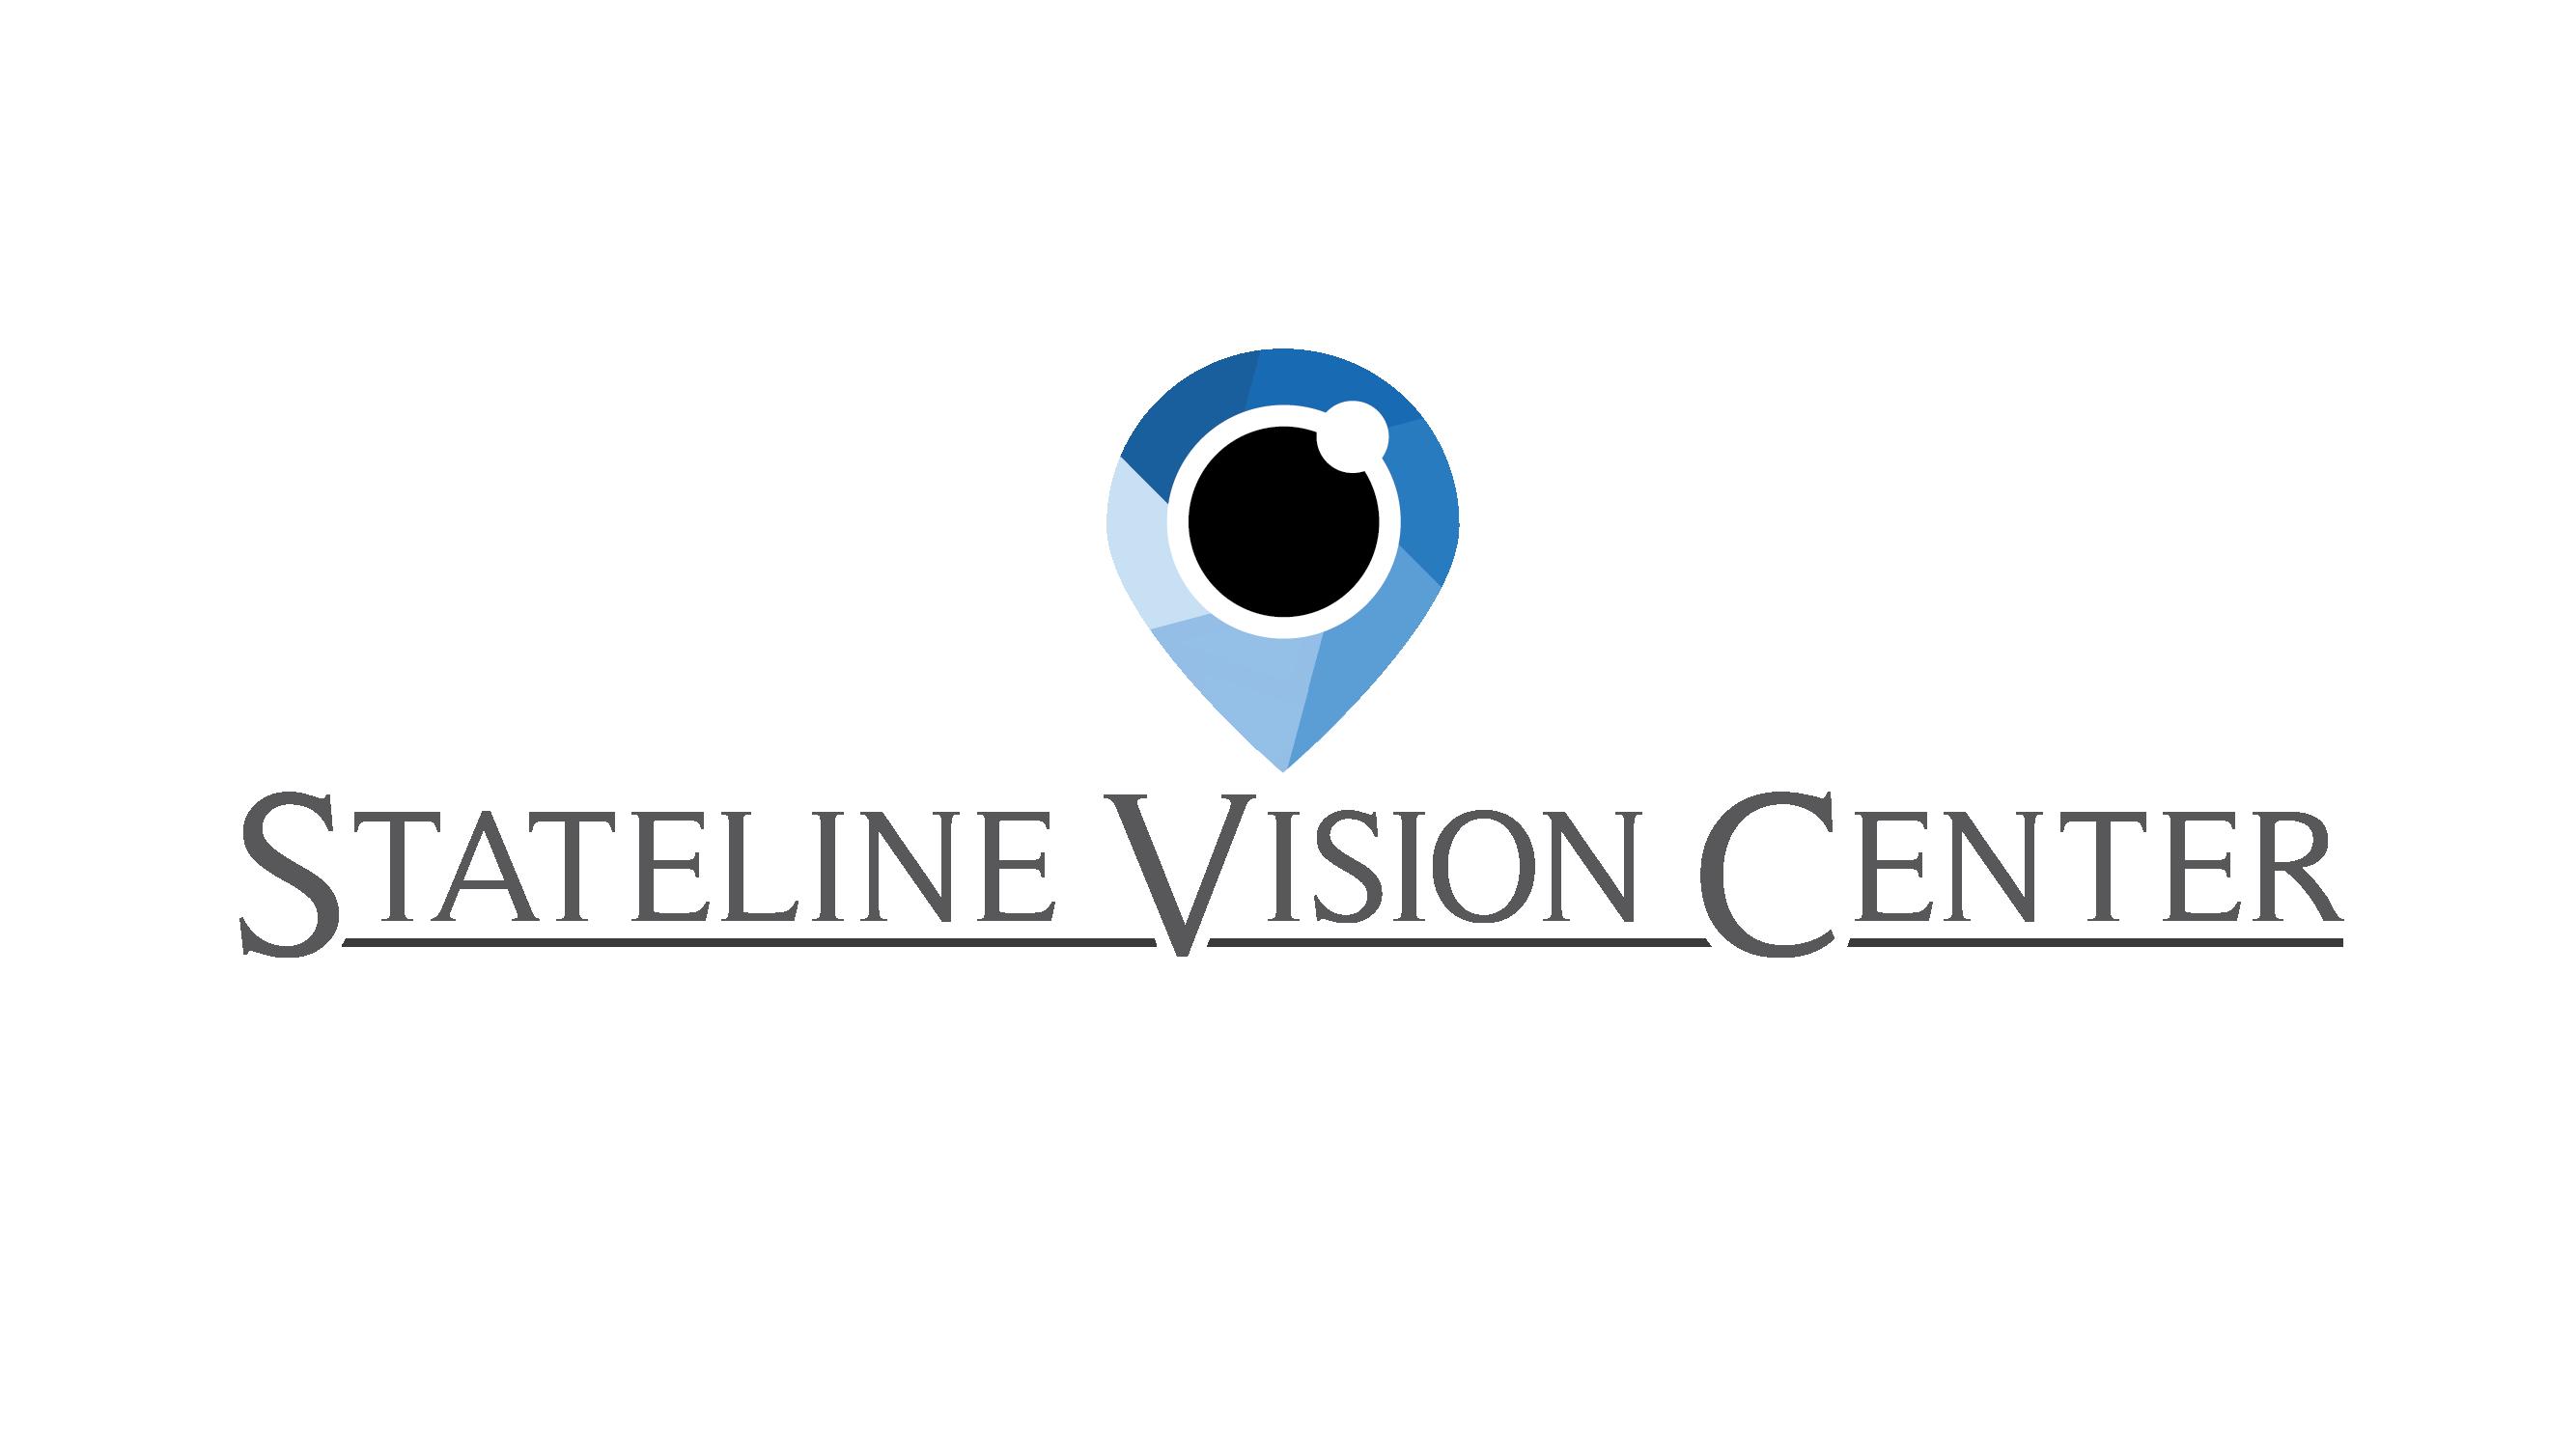 Stateline-Vision-Center-Logo-Final-01